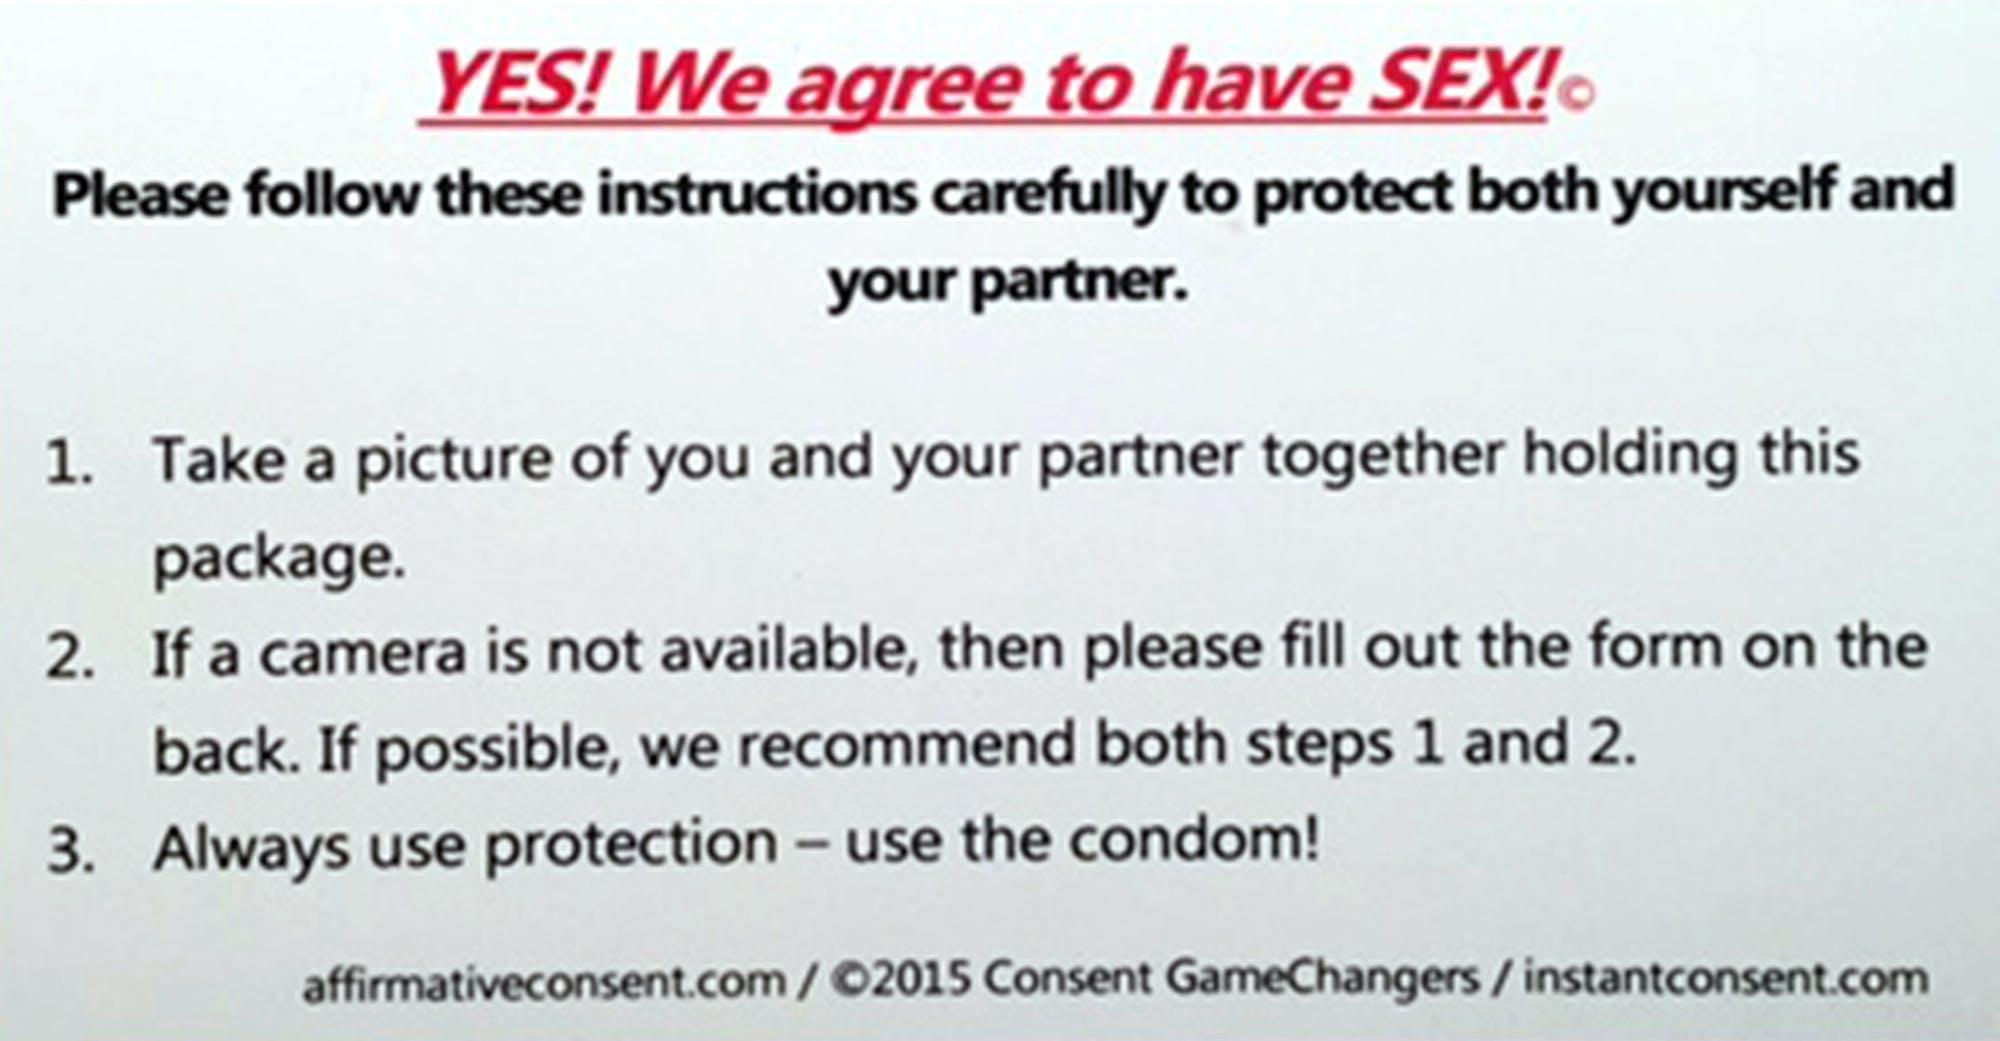 Minnesota law on sex consent